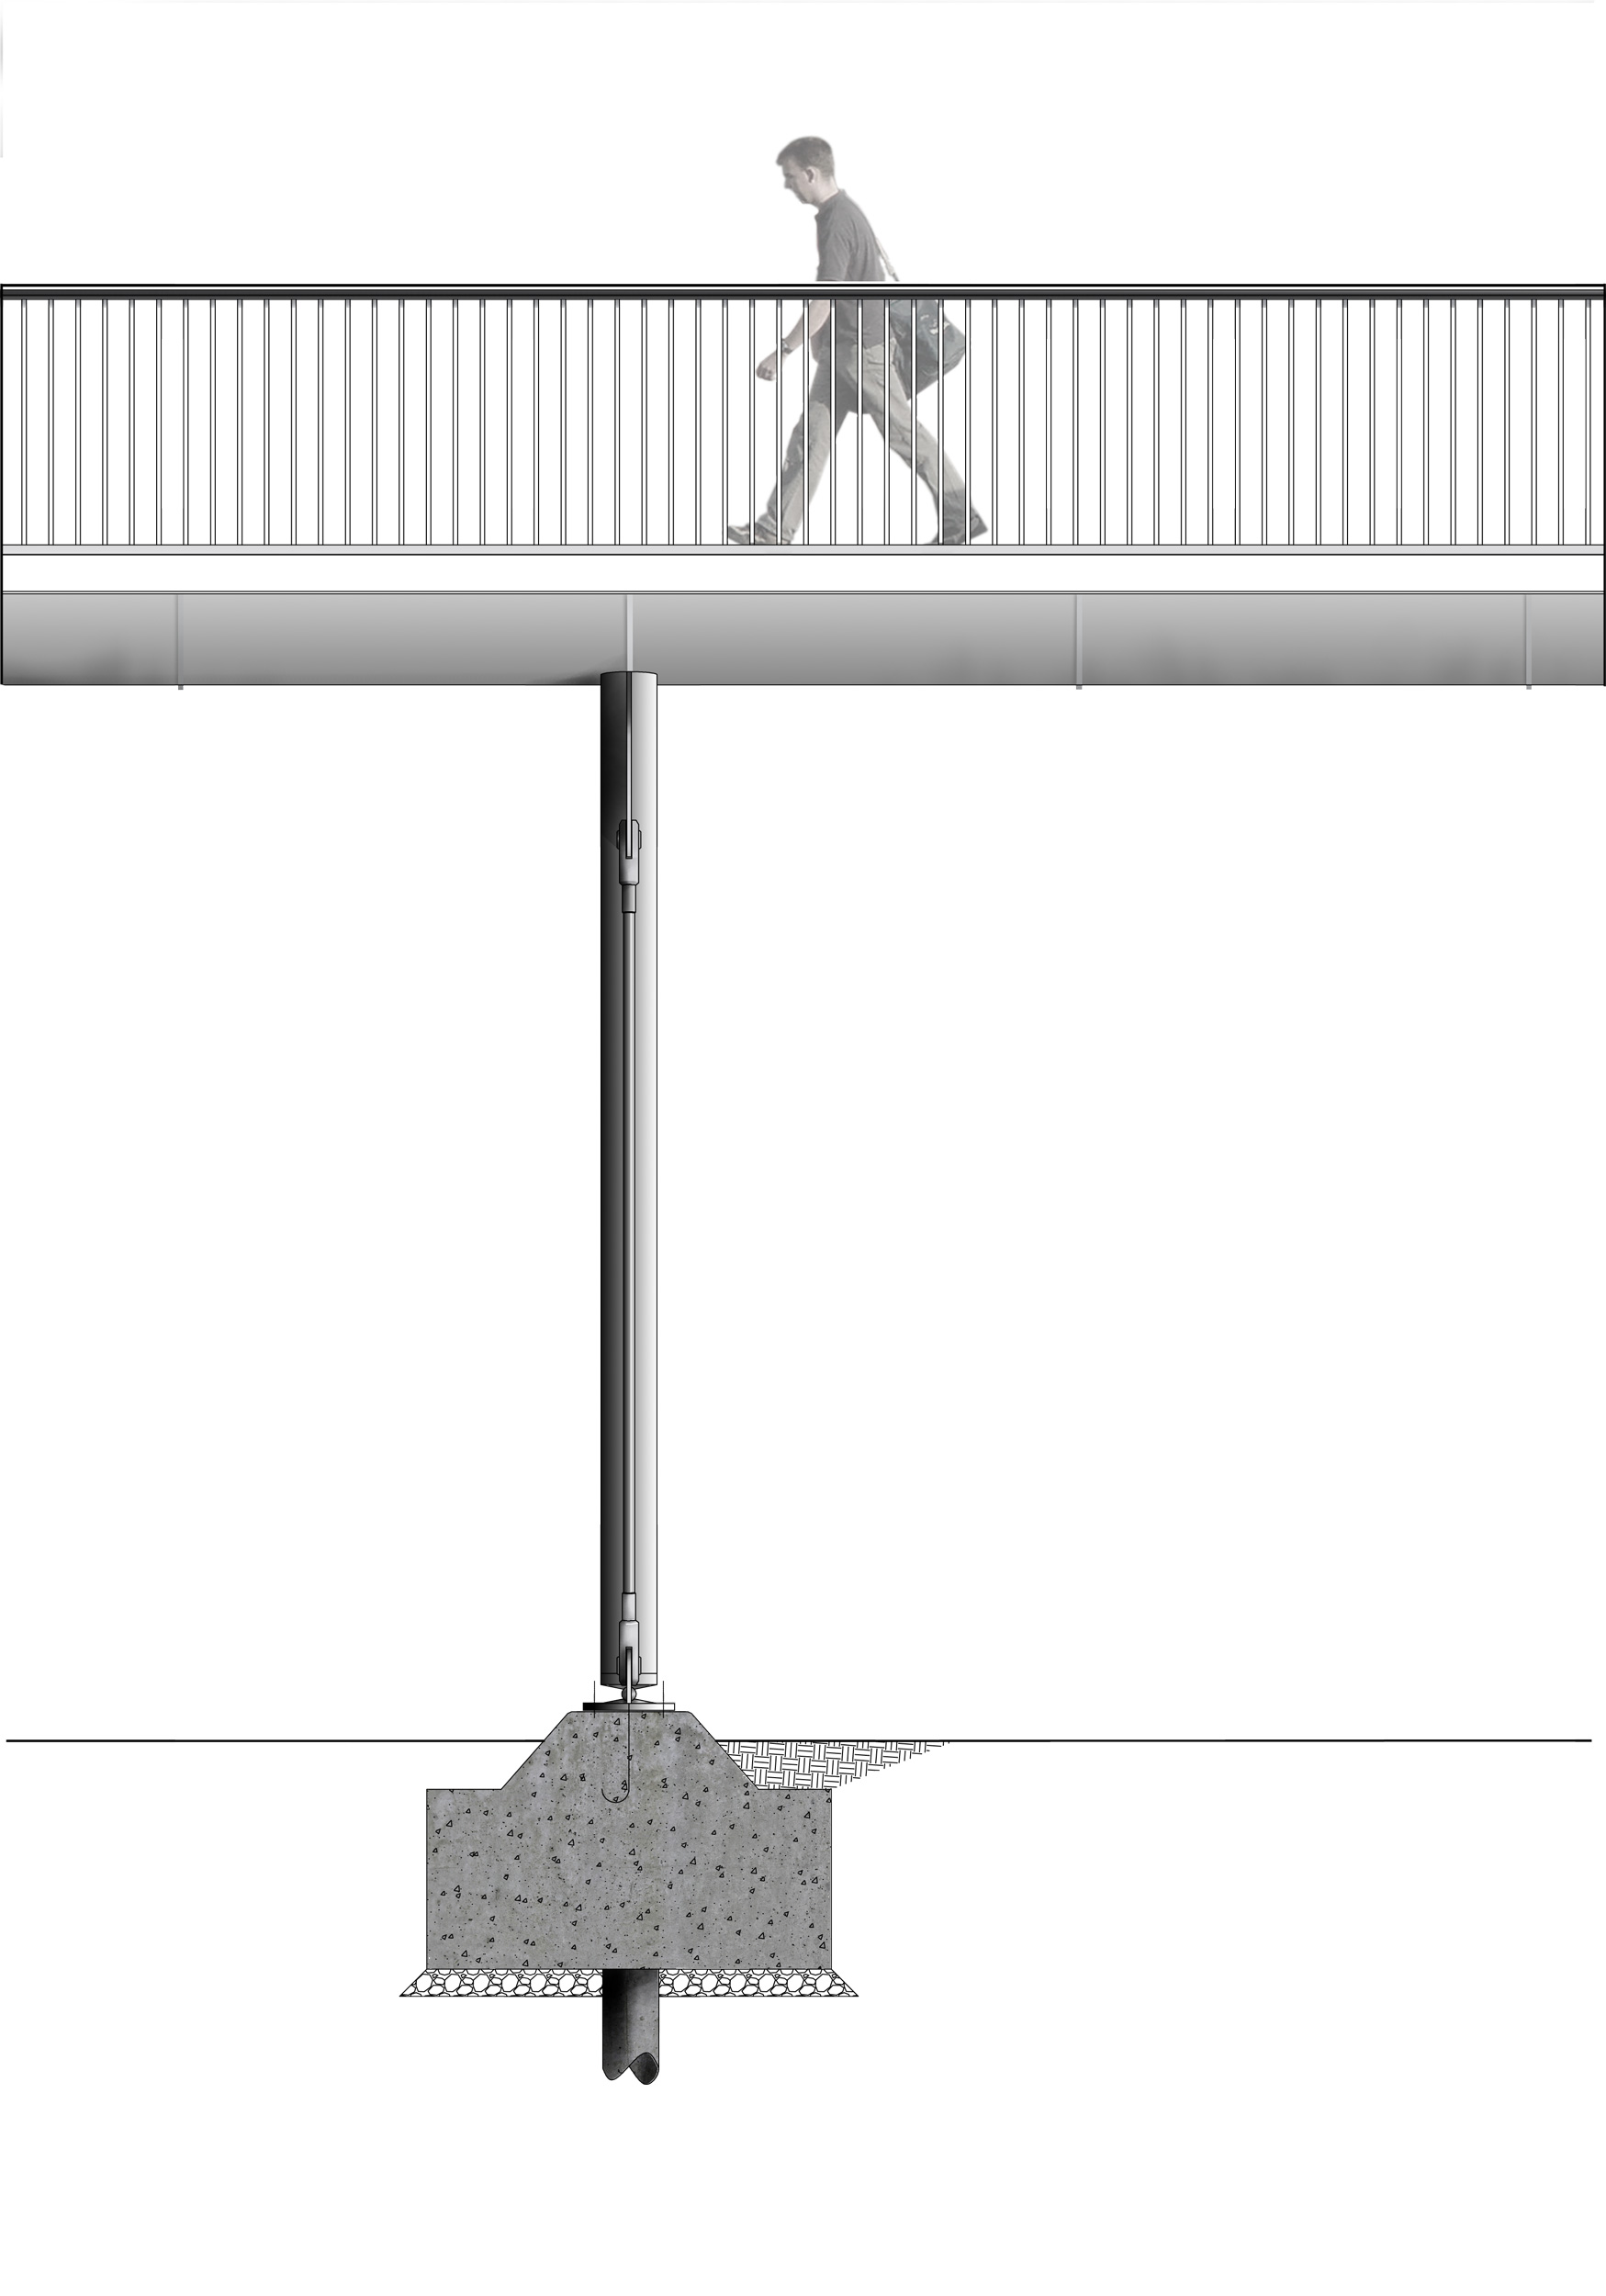 20120410-Cross-section-bridge-deck-Layout1-(4)-(1).jpg